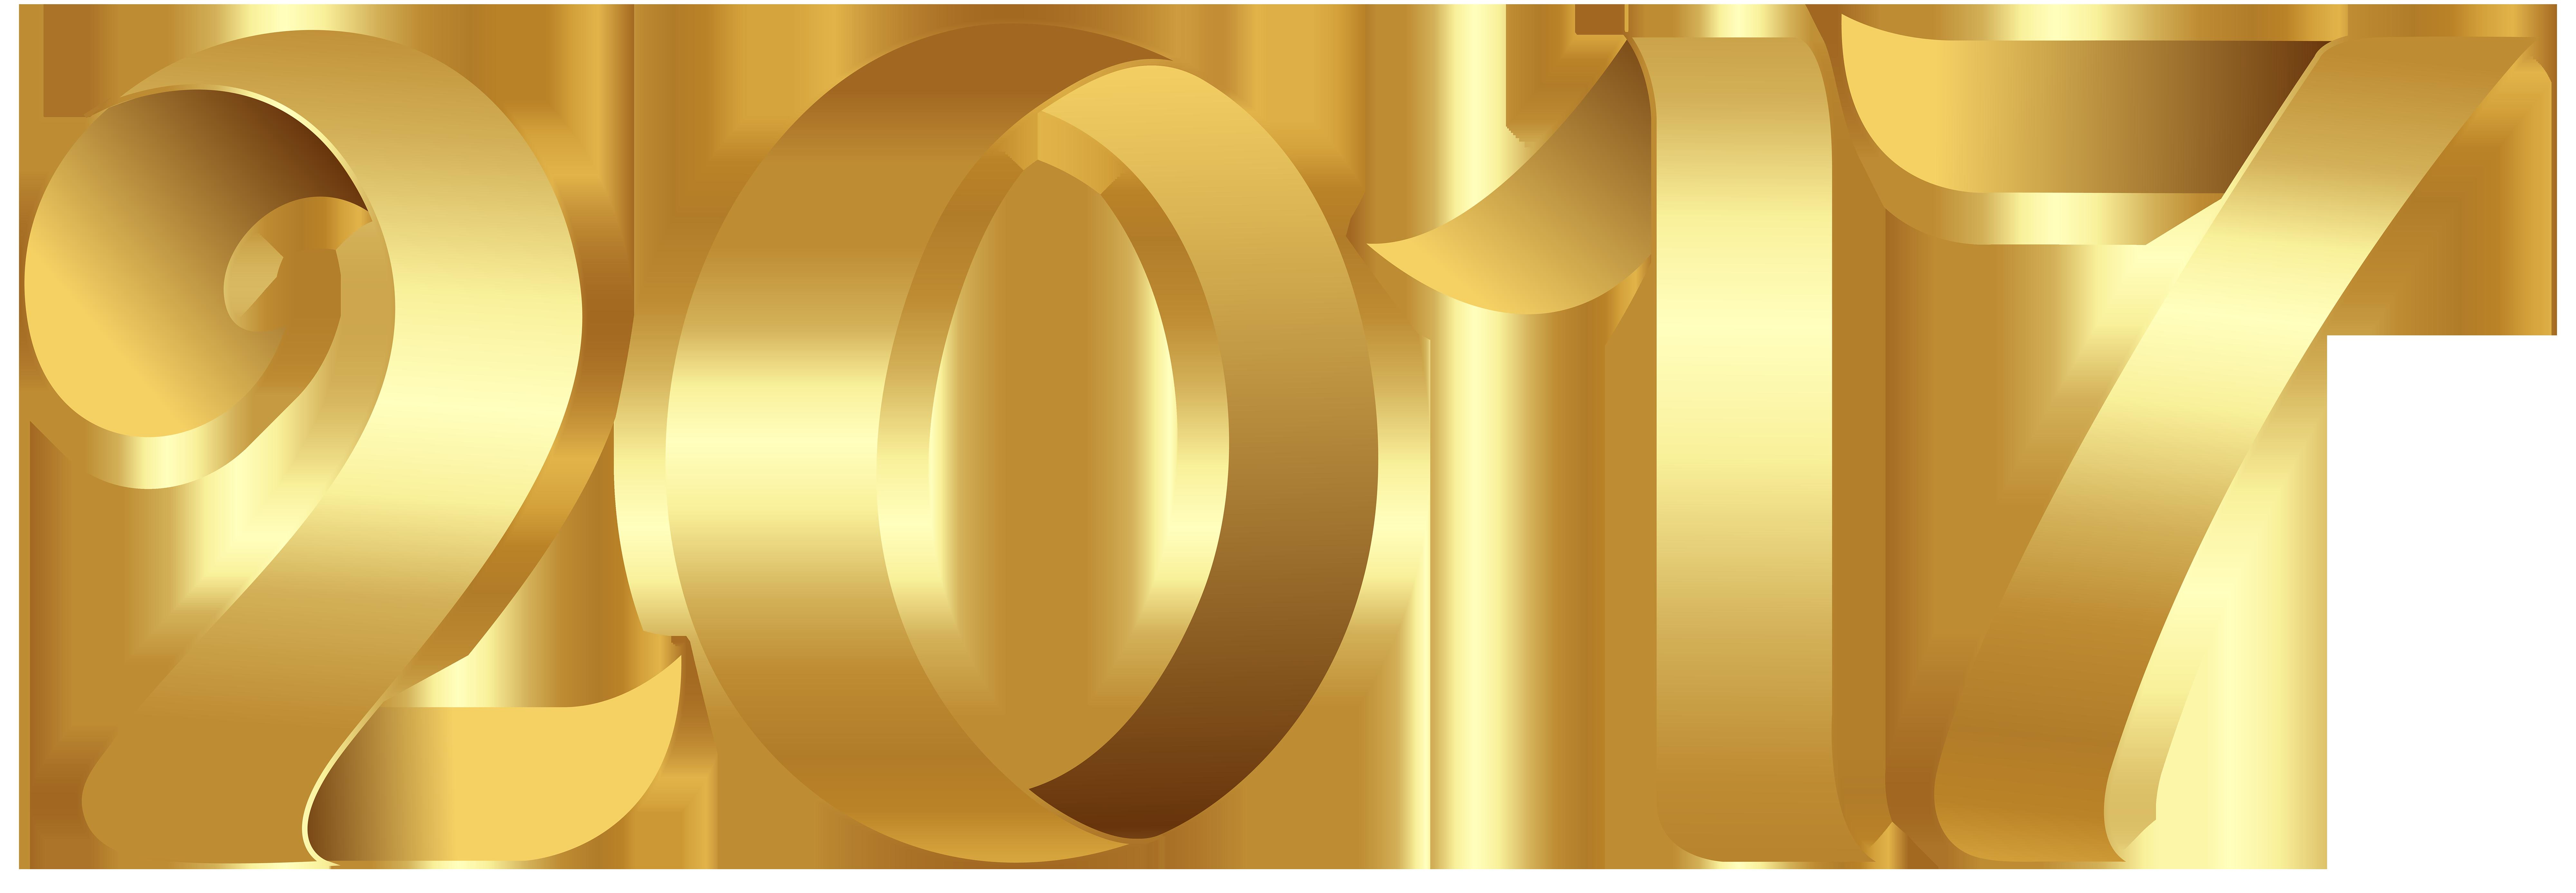 Gold 2017 Transparent PNG Clip Art Image.